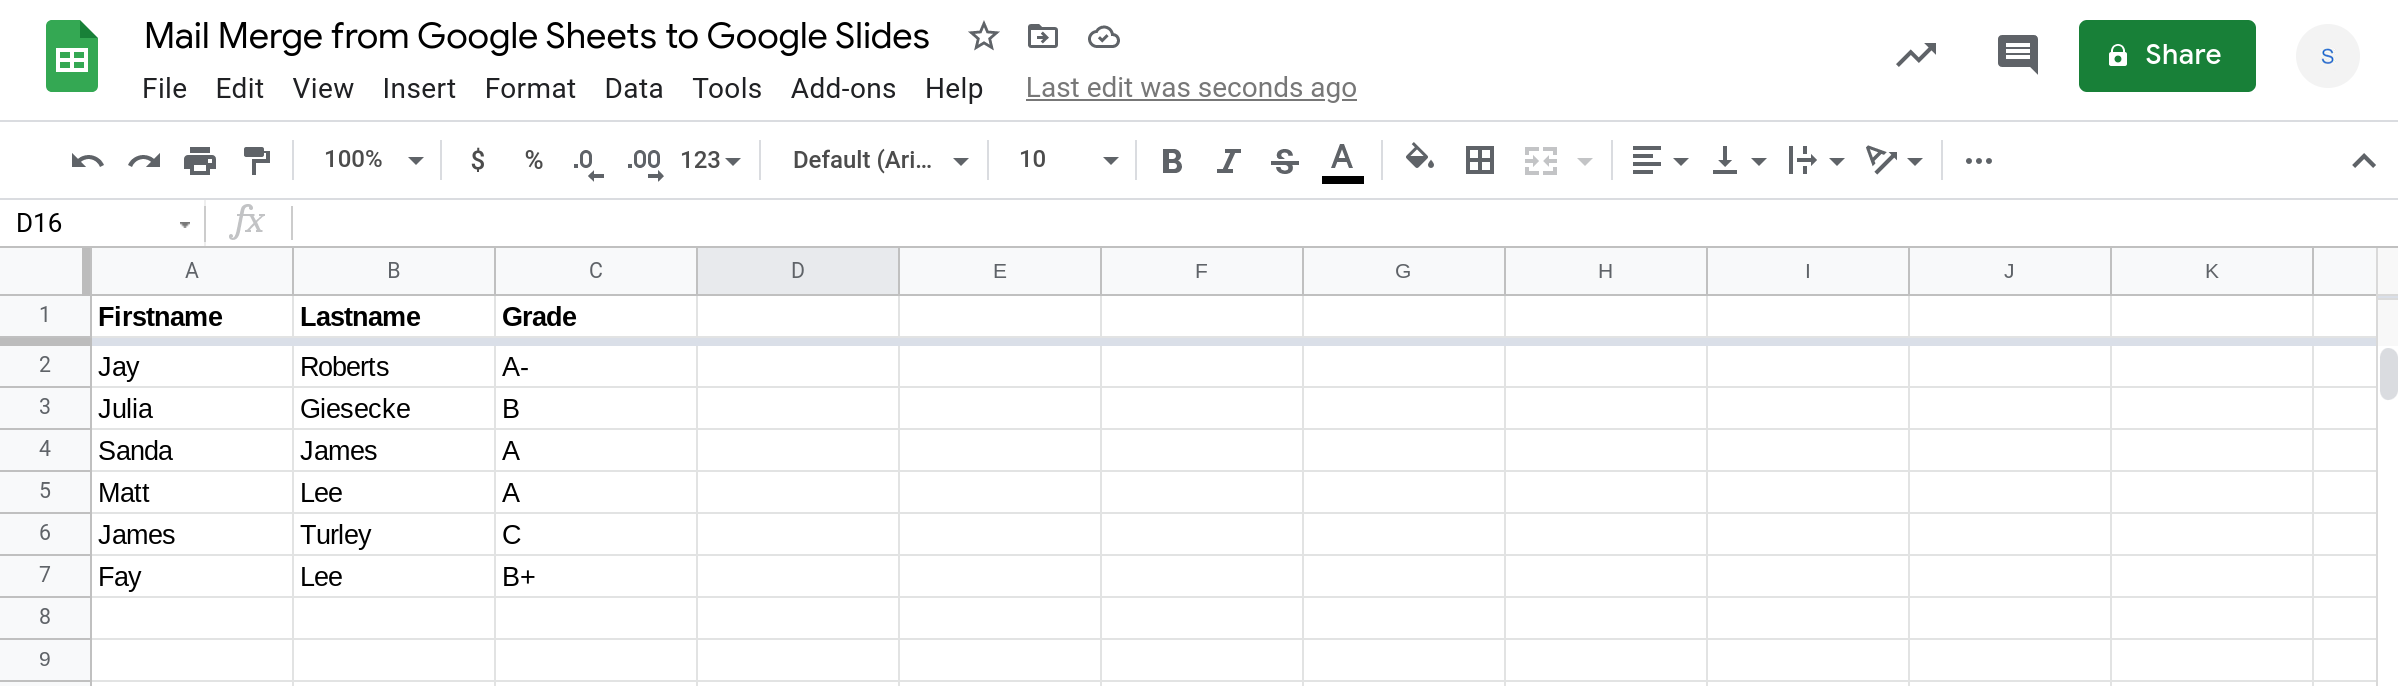 Screenshot of a Google Sheets spreadsheet.